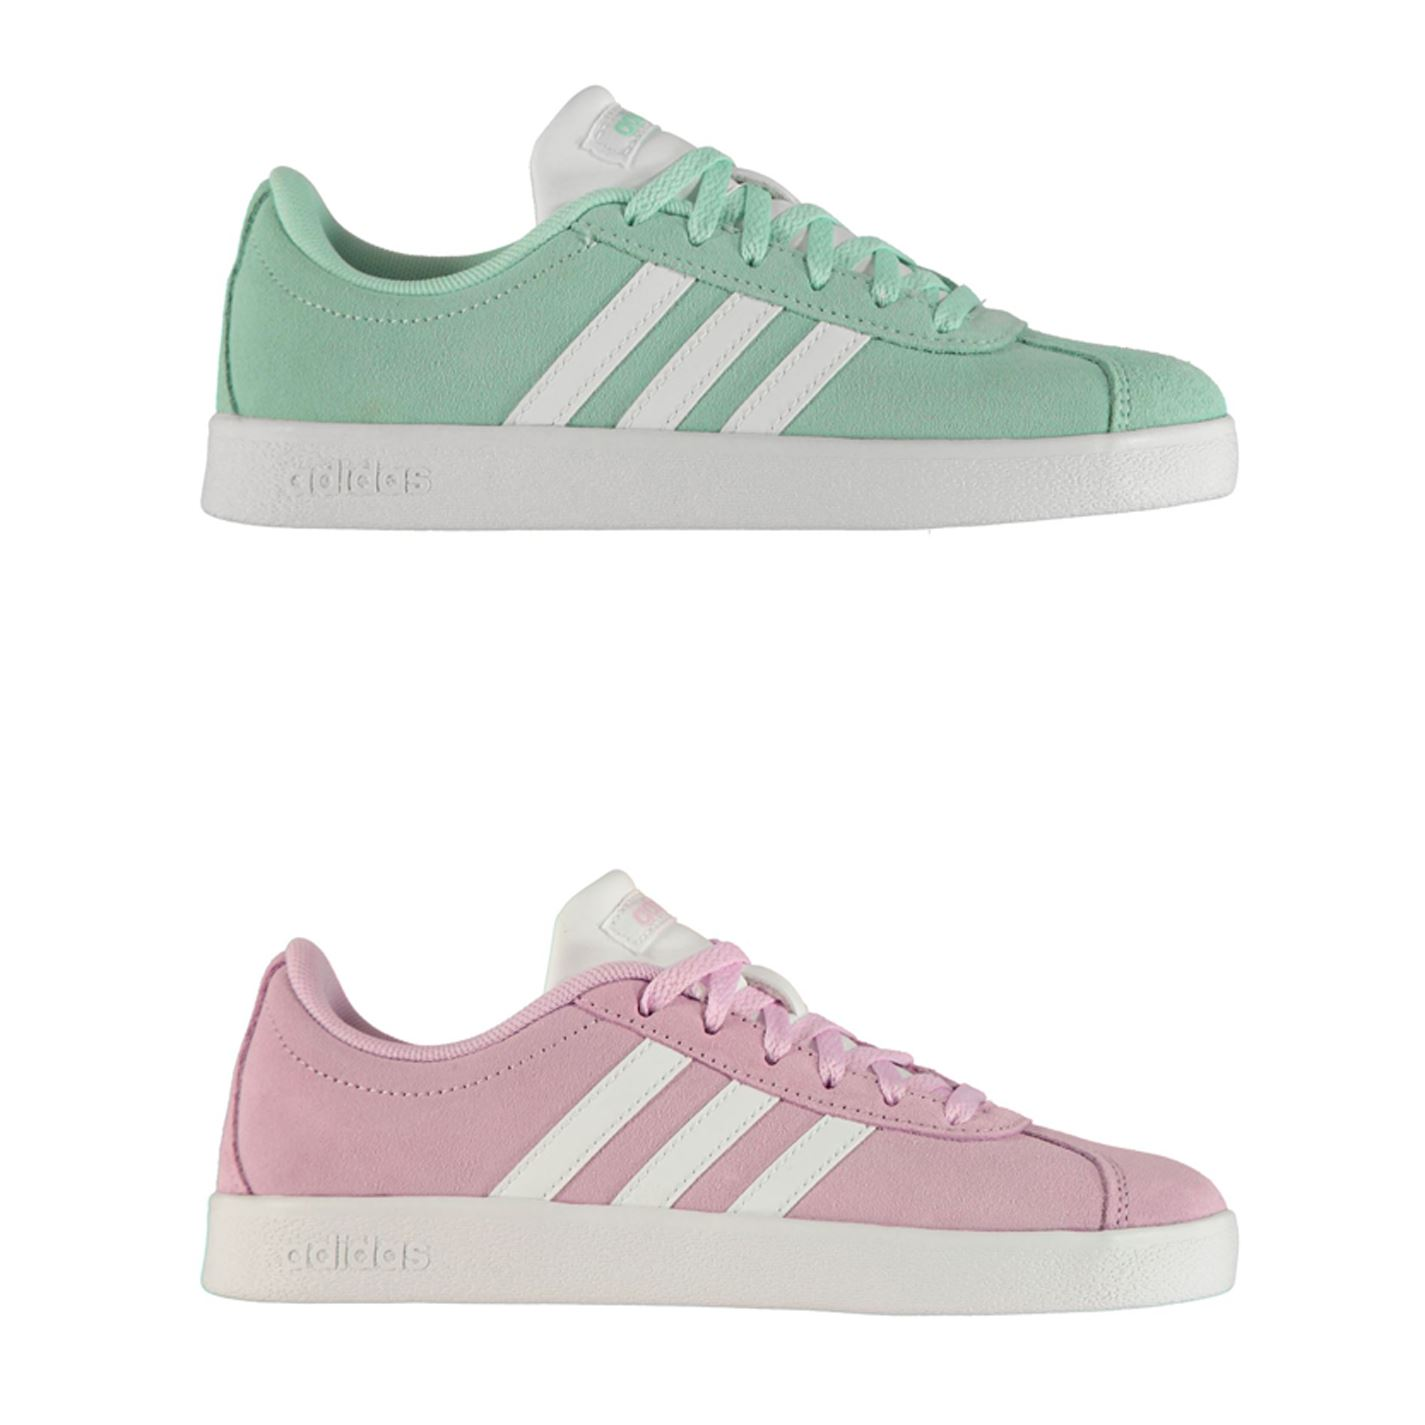 chaussures enfant filles adidas